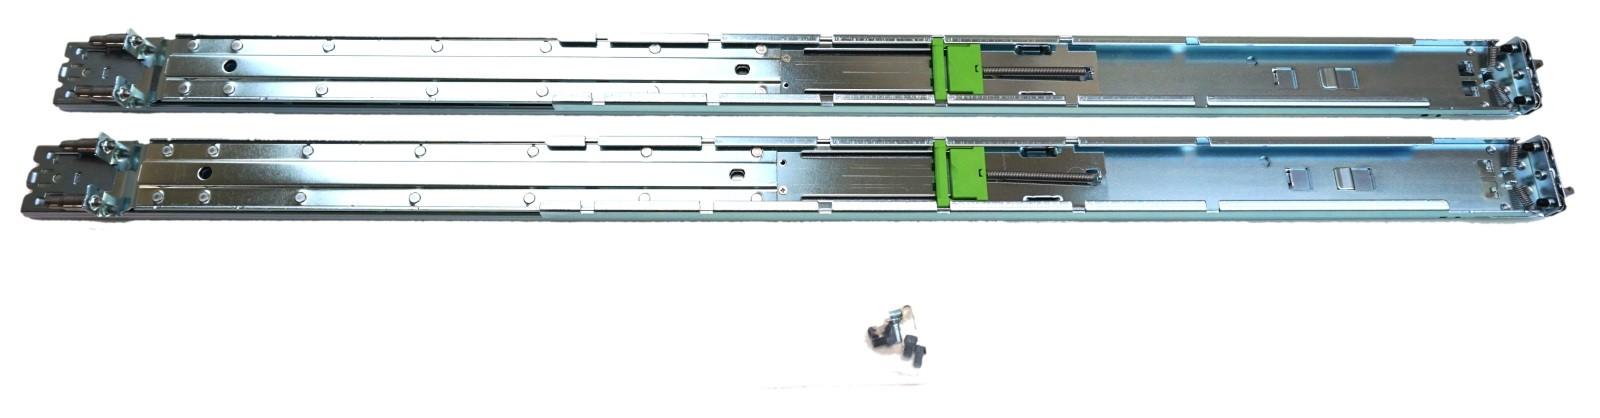 FUJITSU RX200 S7 DRIVERS WINDOWS 7 (2019)